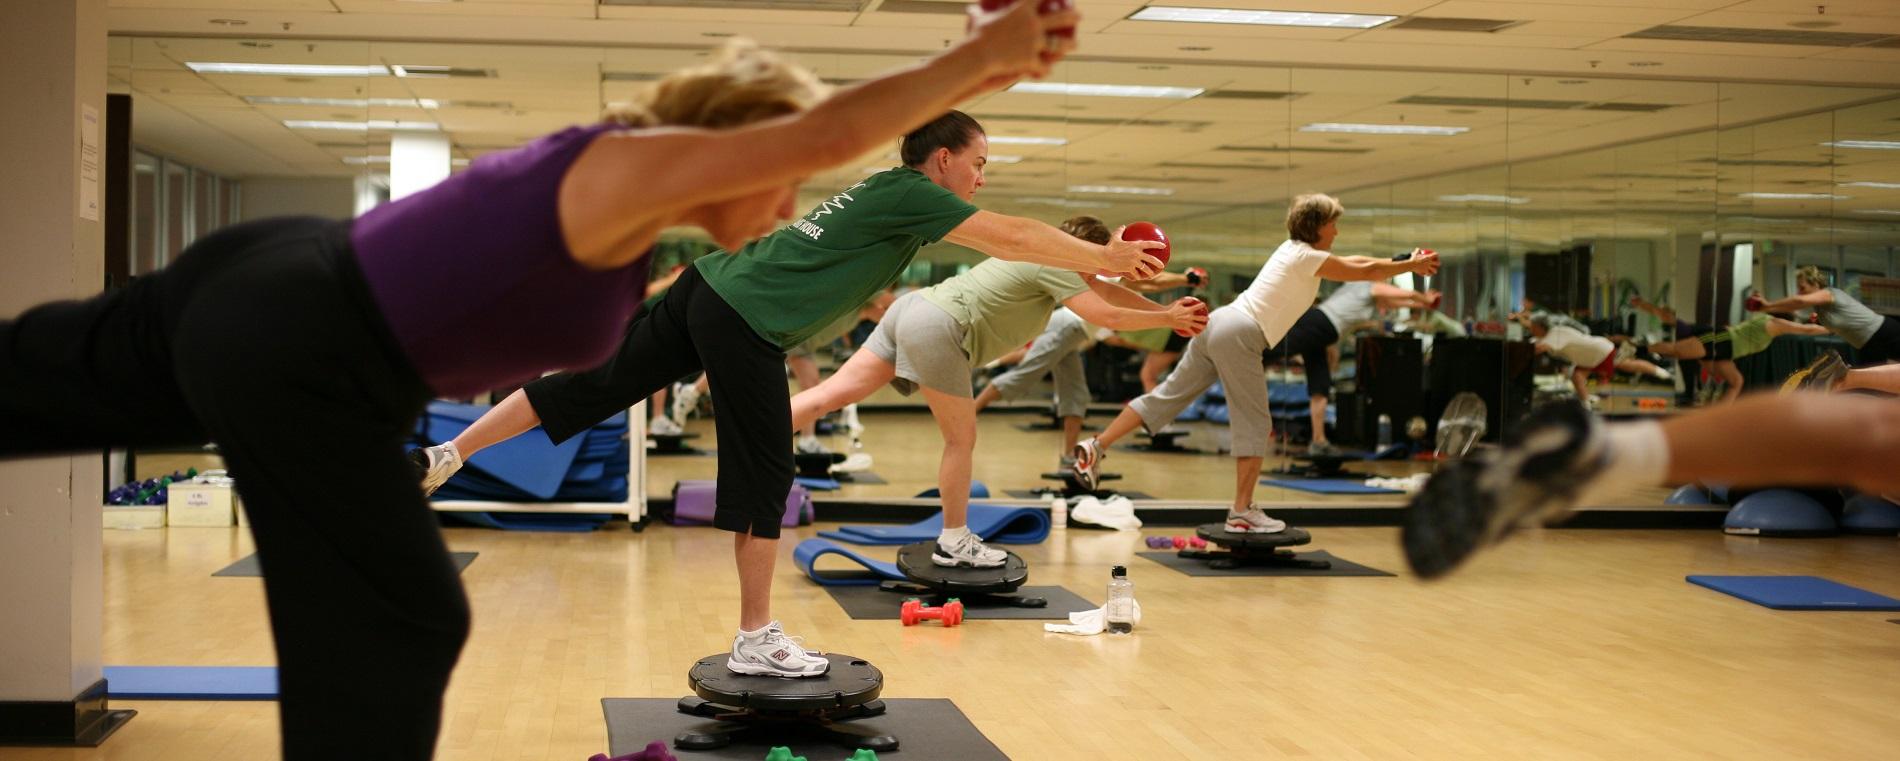 Challenge Center For Health Fitness